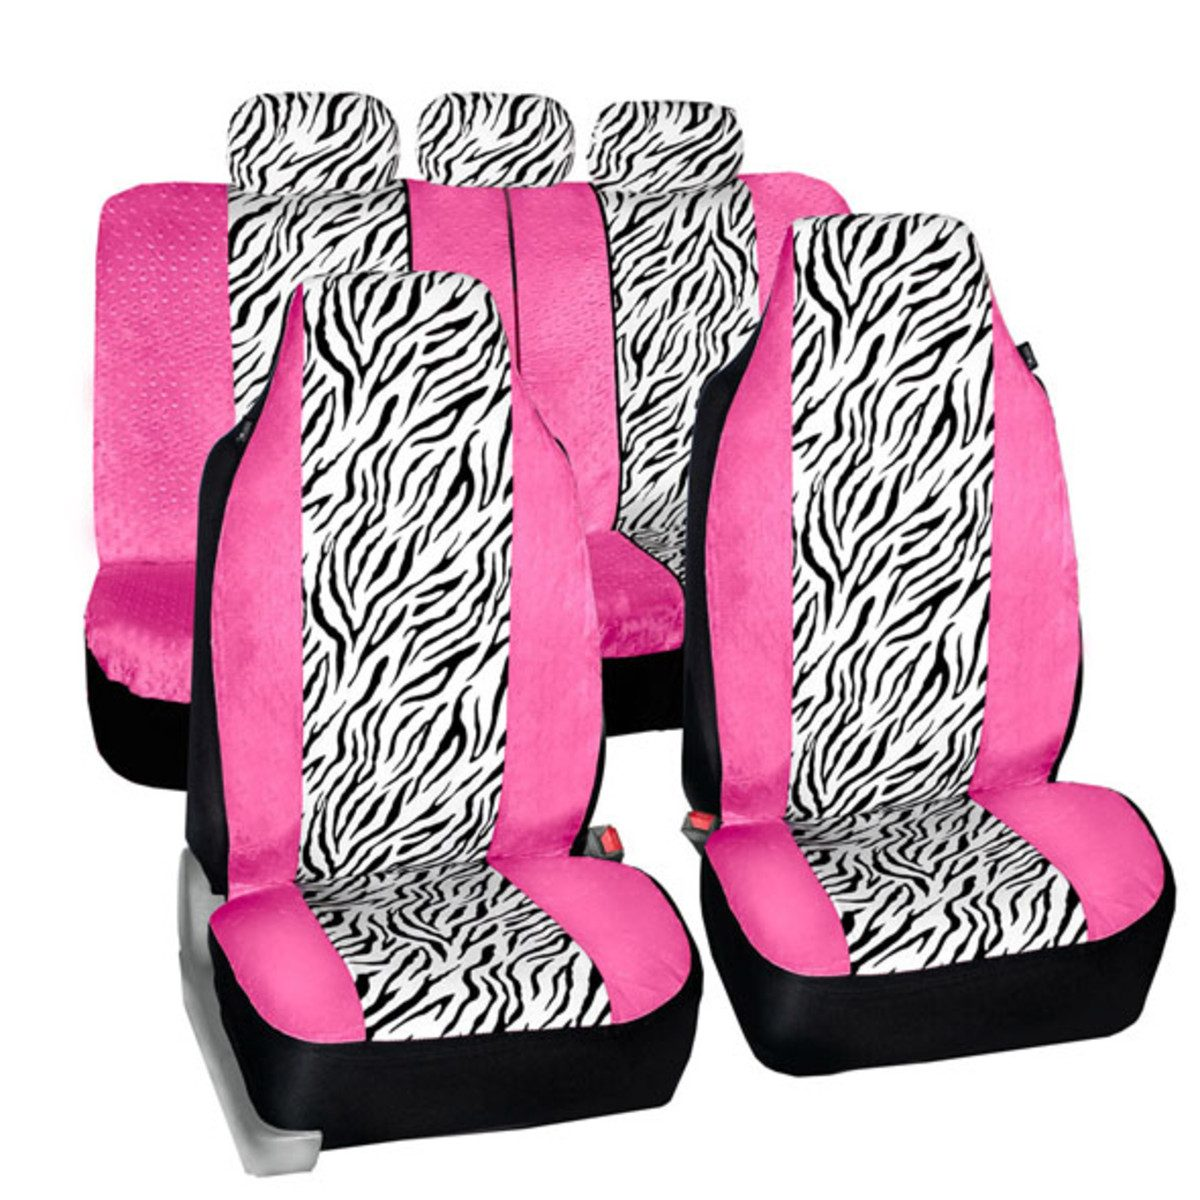 88-FB121115_pinkwhite seatcover 1